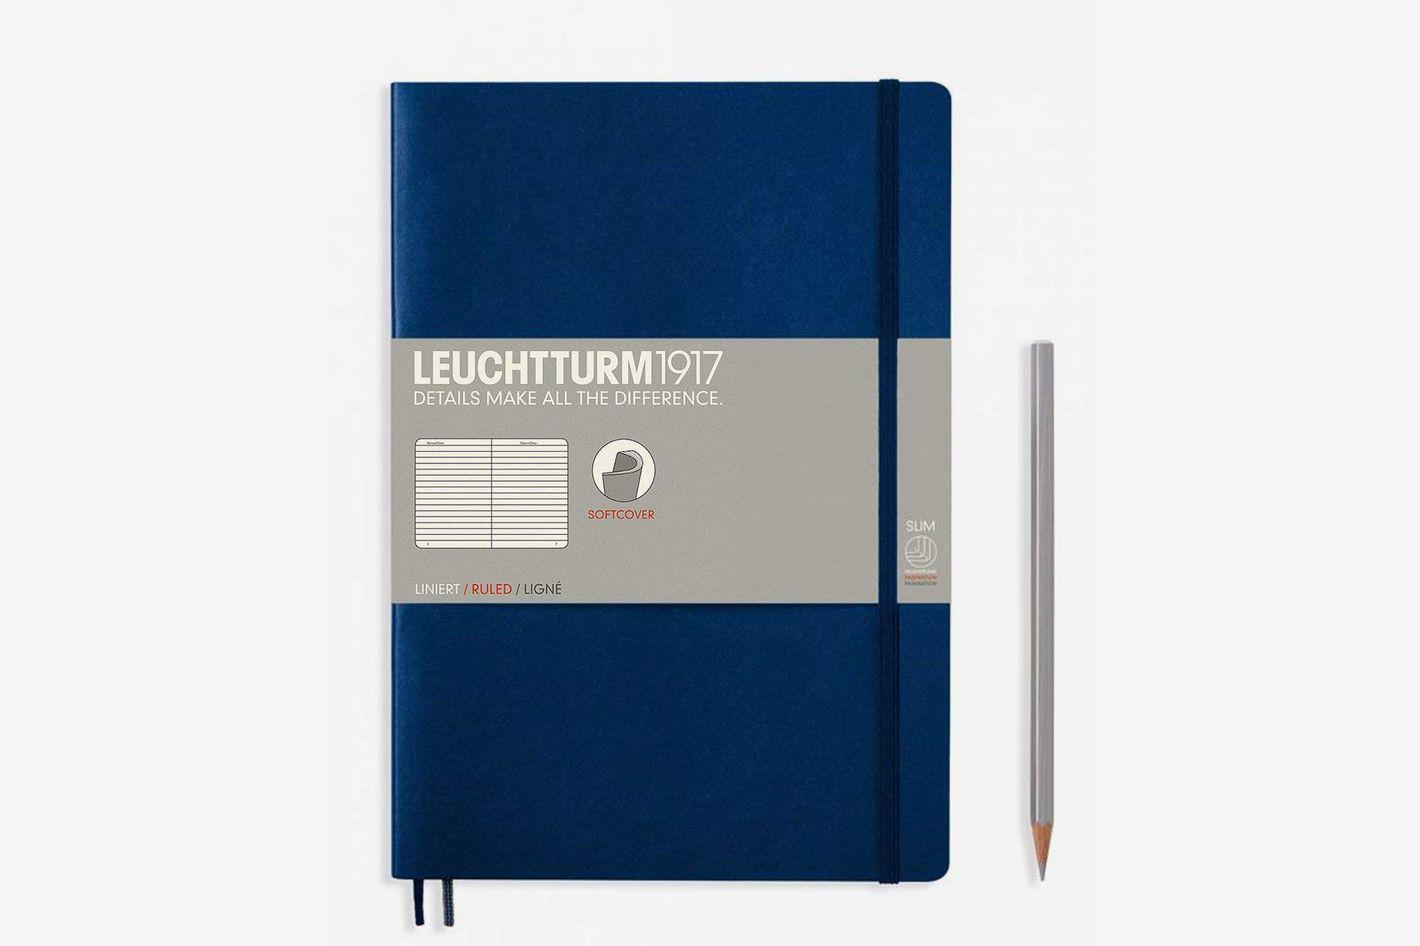 Leuchtturm Softcover Composition B5 Ruled Notebook